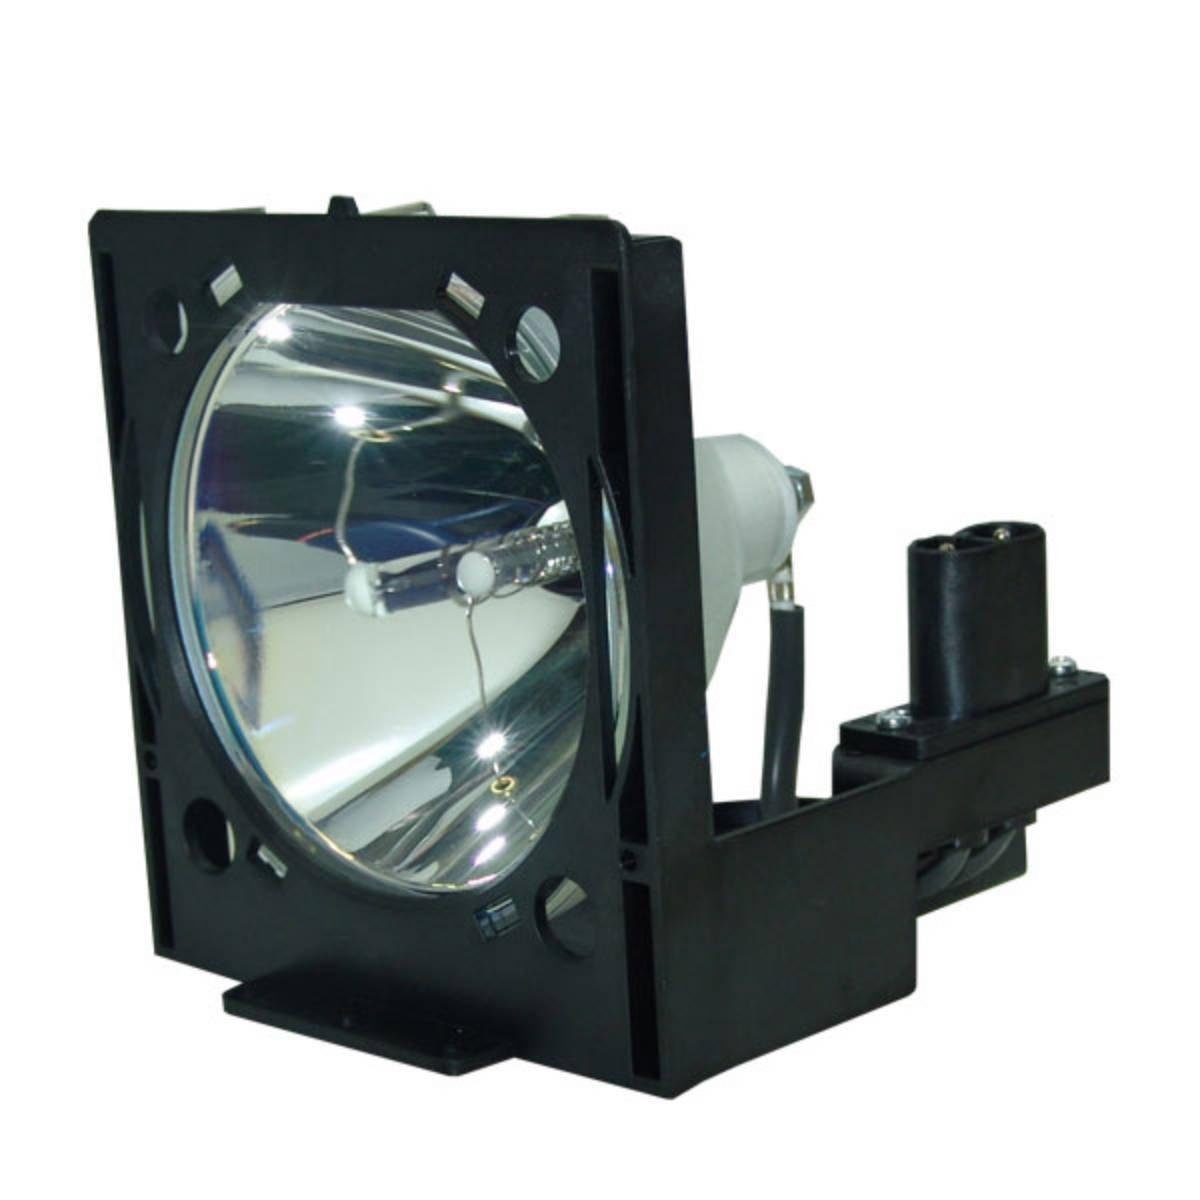 все цены на  POA-LMP14 LMP14 610-265-8828 for SANYO PLC-5600D PLC-5605 PLC-8800N PLC-8805 PLC-8810 PLC-8815 PLC-XR70 Projector Lamp Bulb  онлайн